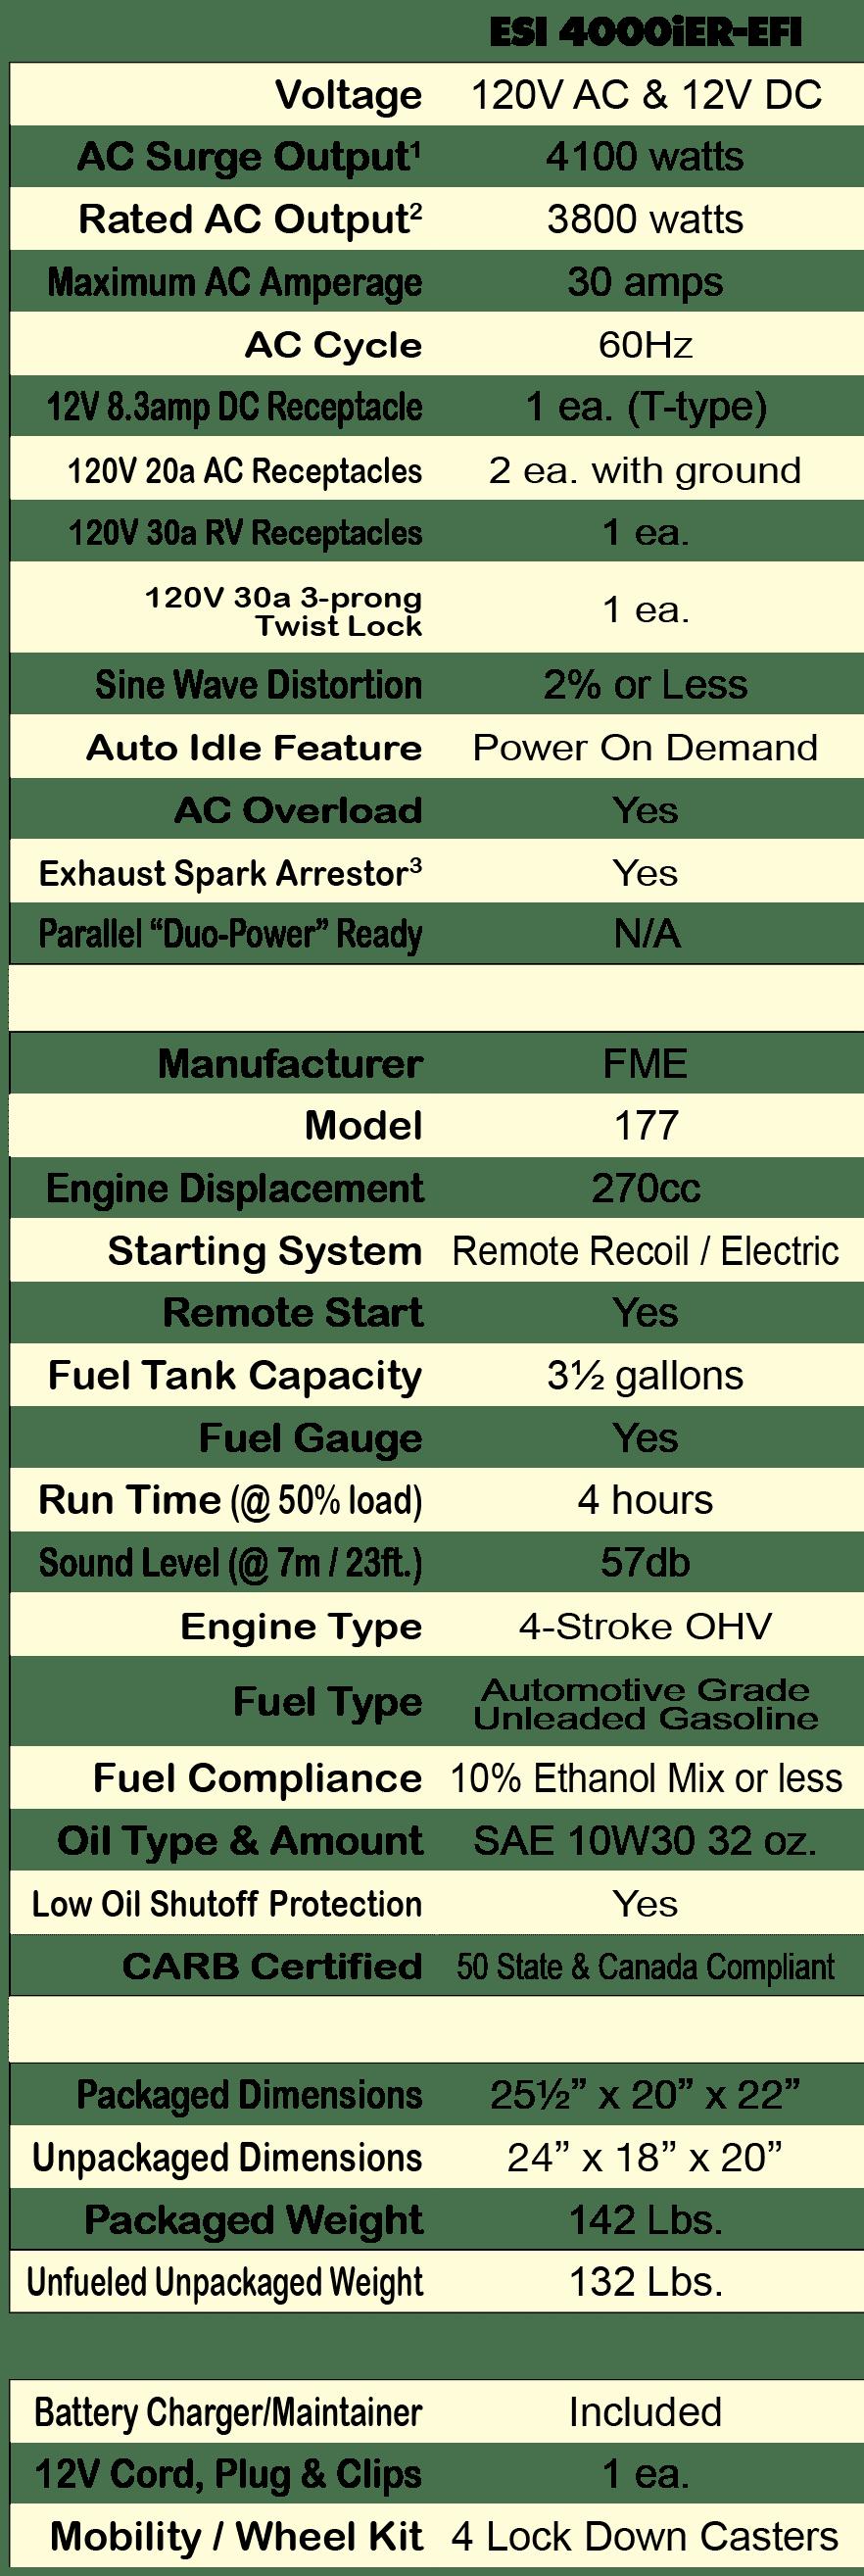 ESI4000iER-EFI